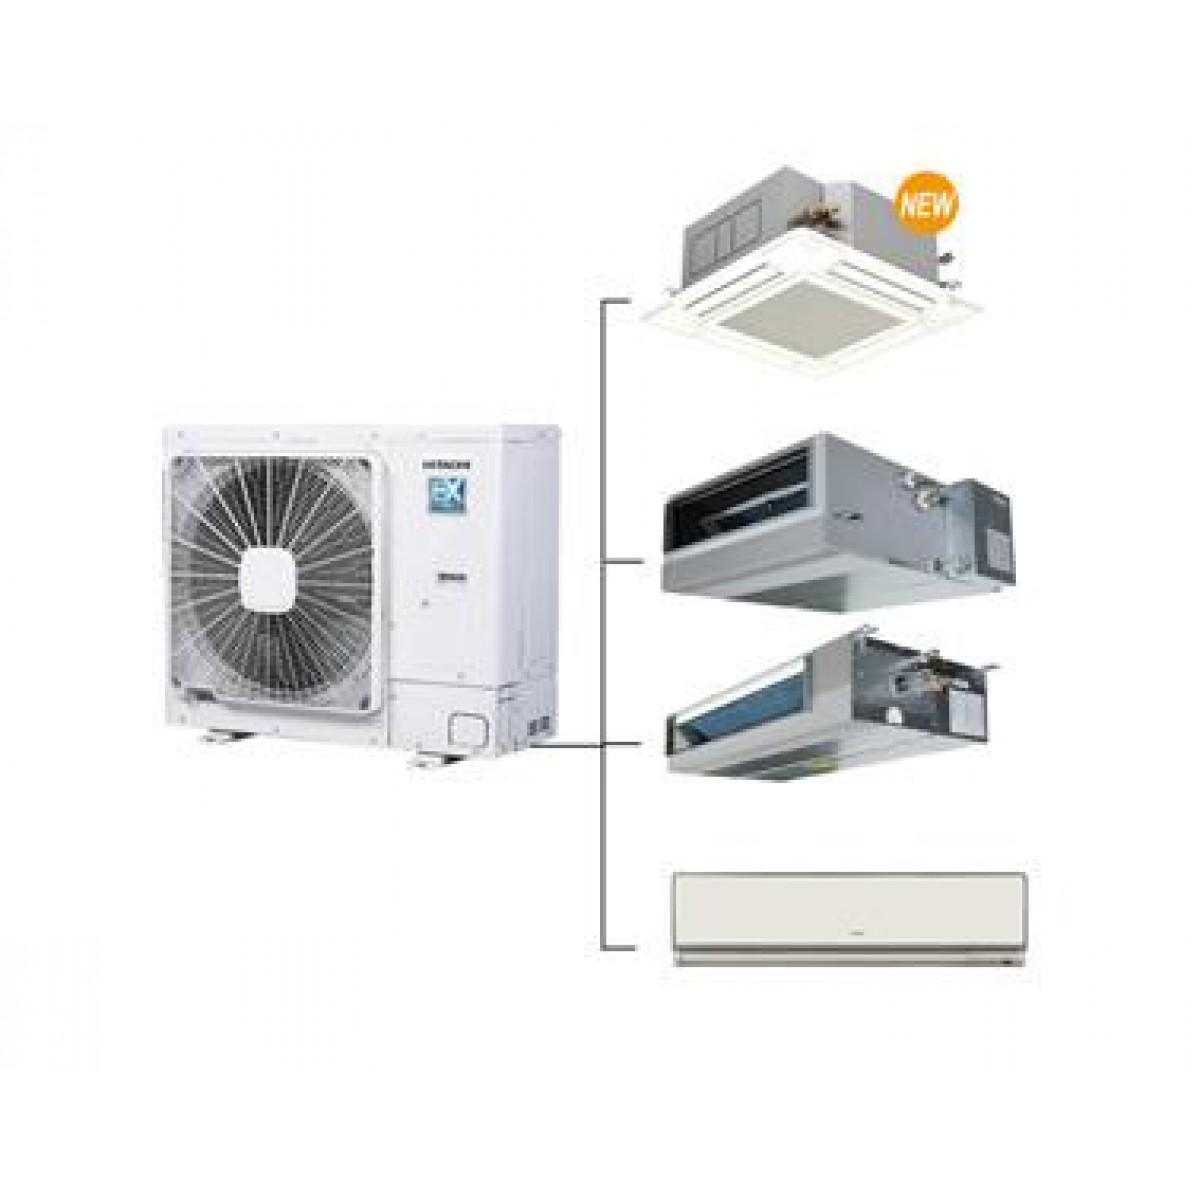 HITACHI日立中央空调多联风管机变频 EXPRO系列